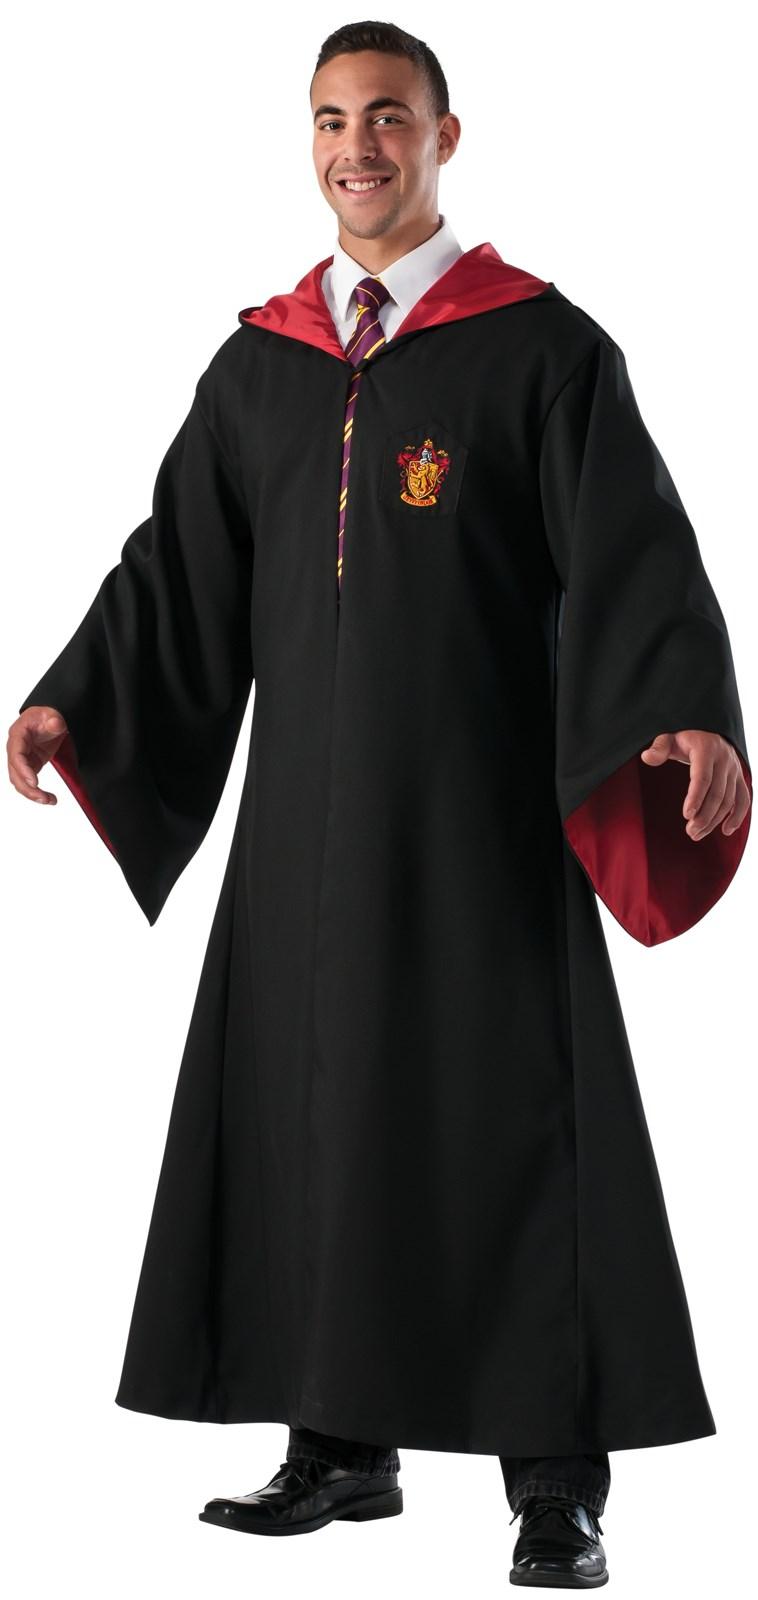 Harry Potter Deluxe Replica Gryffindor Robe For Men